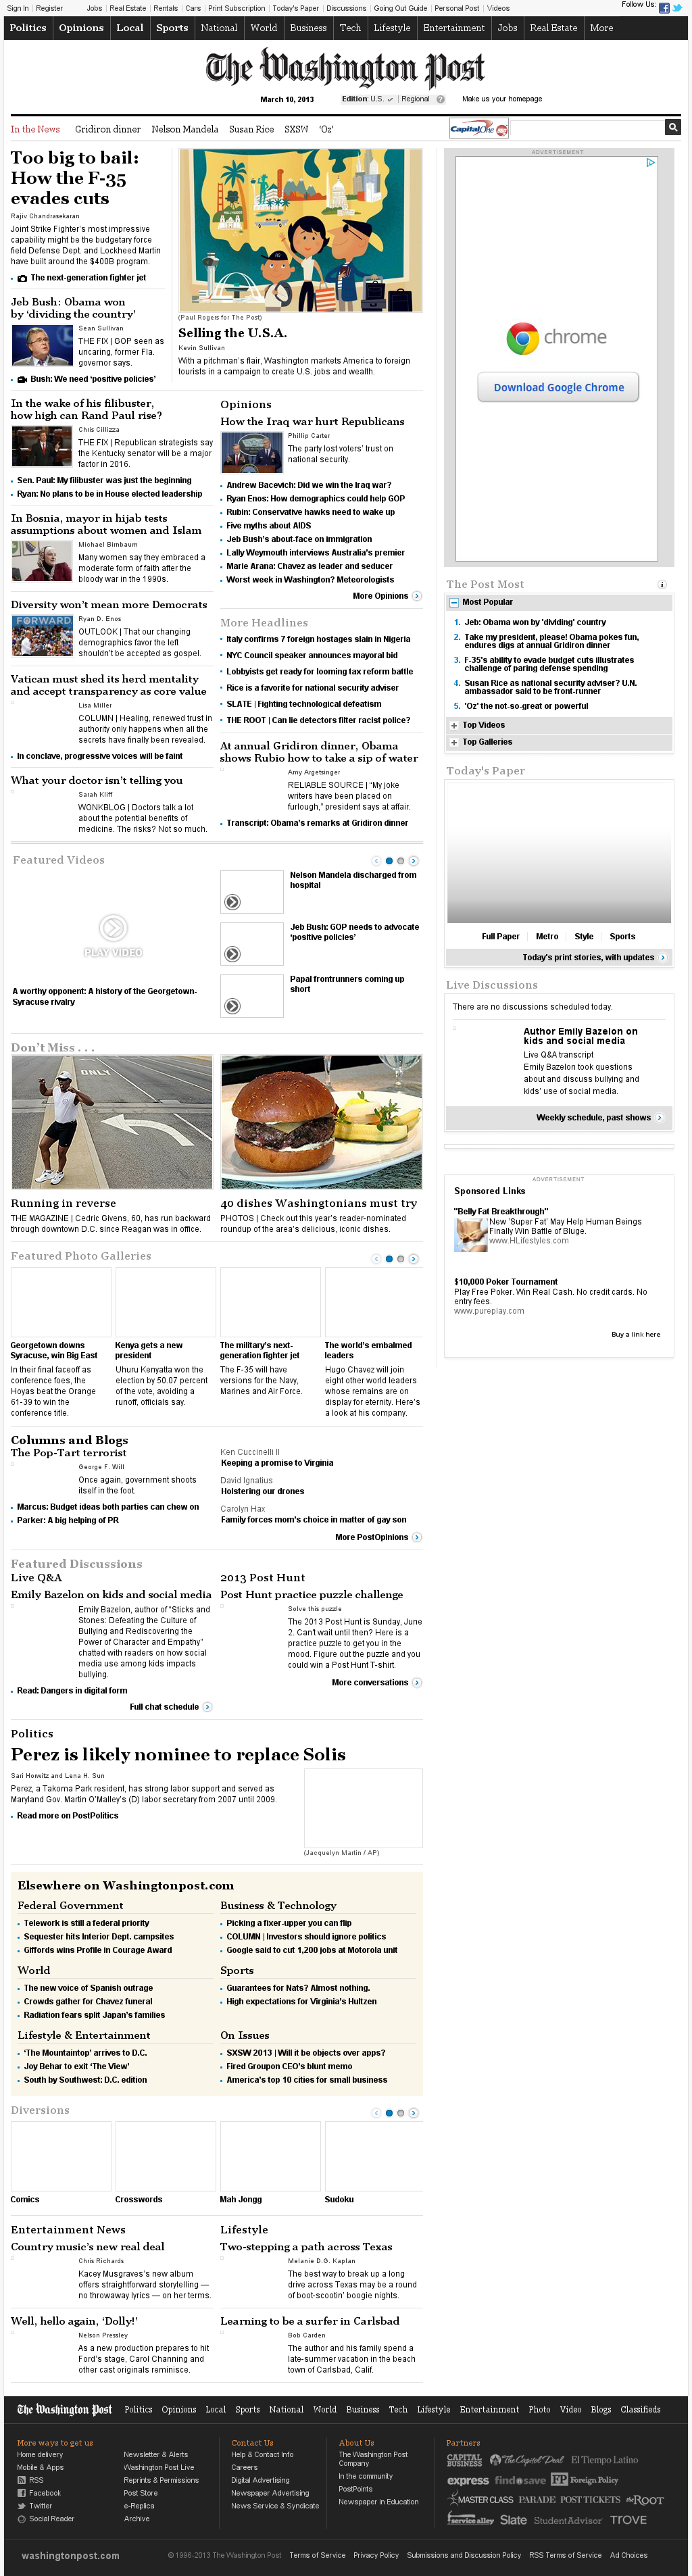 The Washington Post at Sunday March 10, 2013, 7:25 p.m. UTC